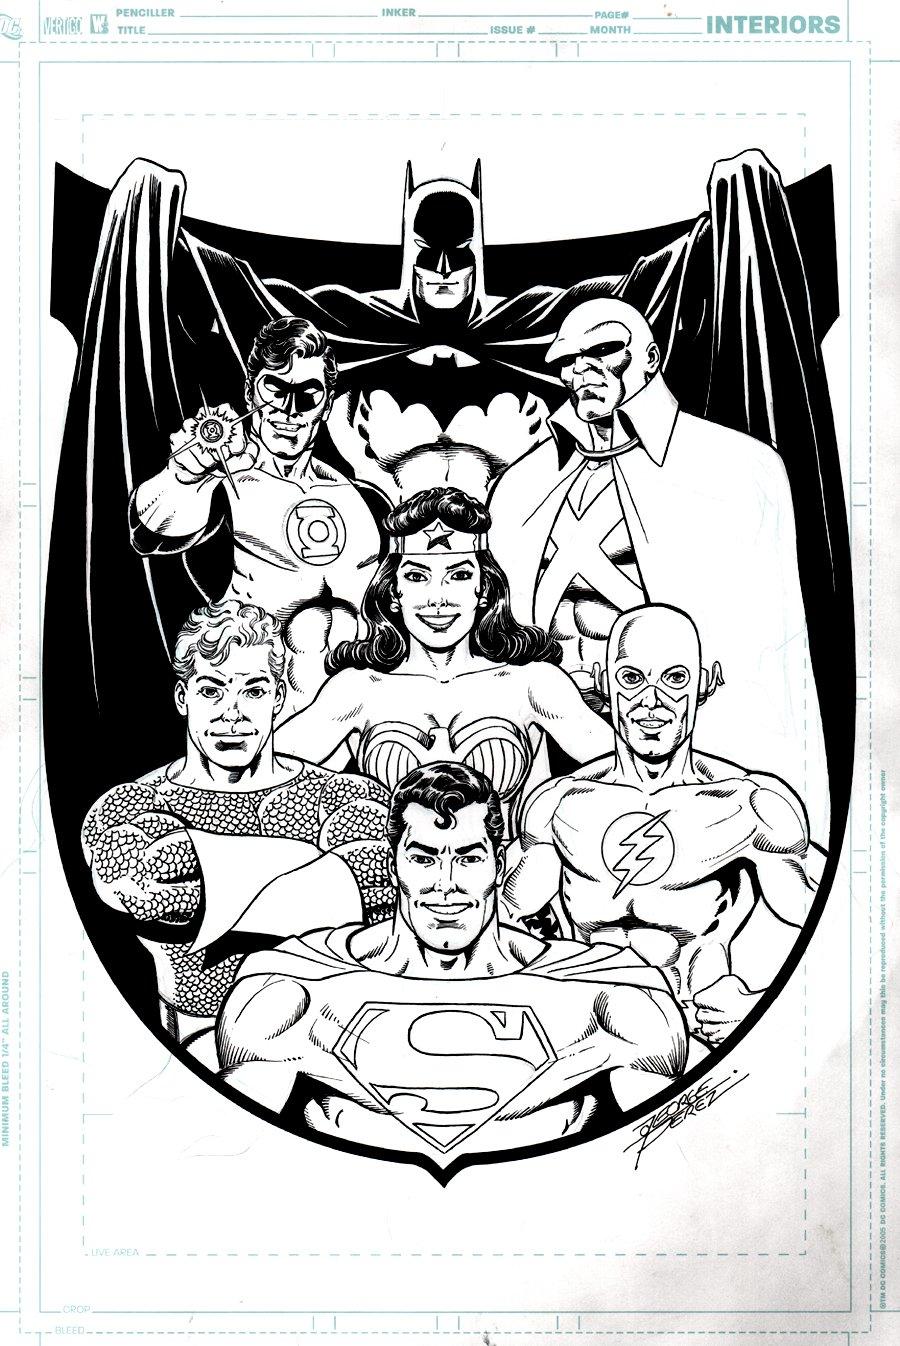 JLA Published Comic-Con Book Cover & T-Shirt Design art